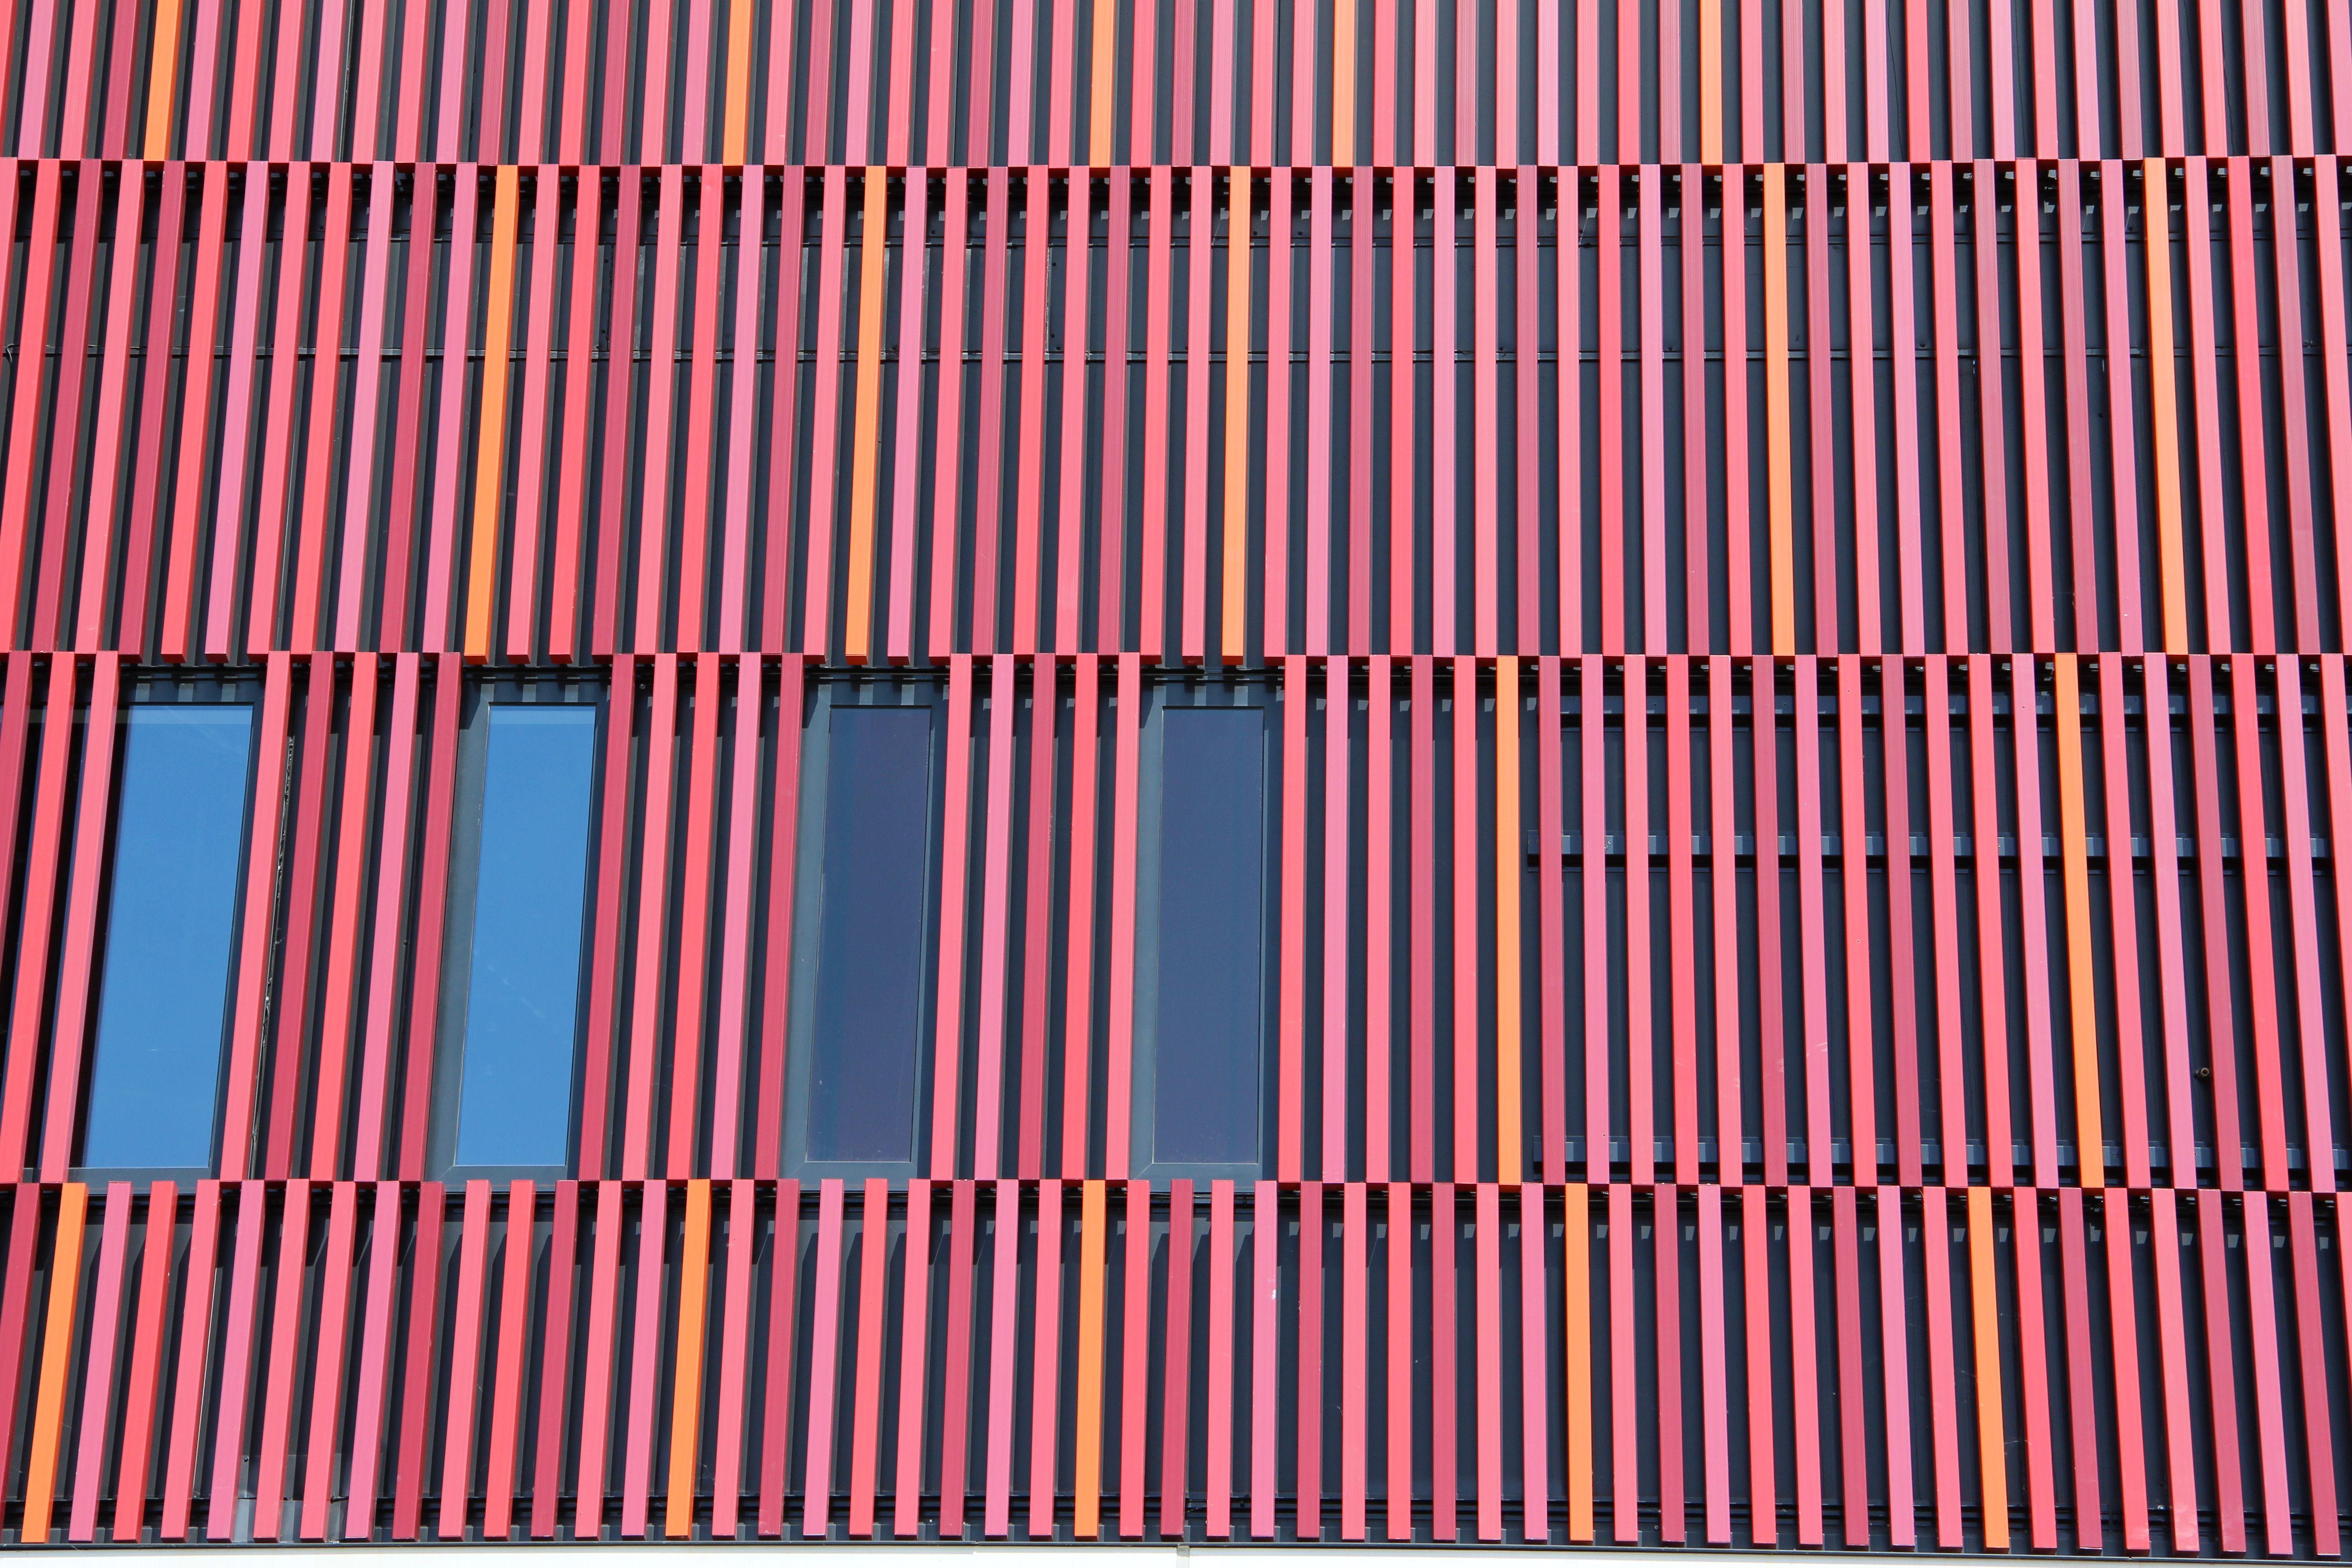 Signalement gevel 2016 » bouwwereld.nl